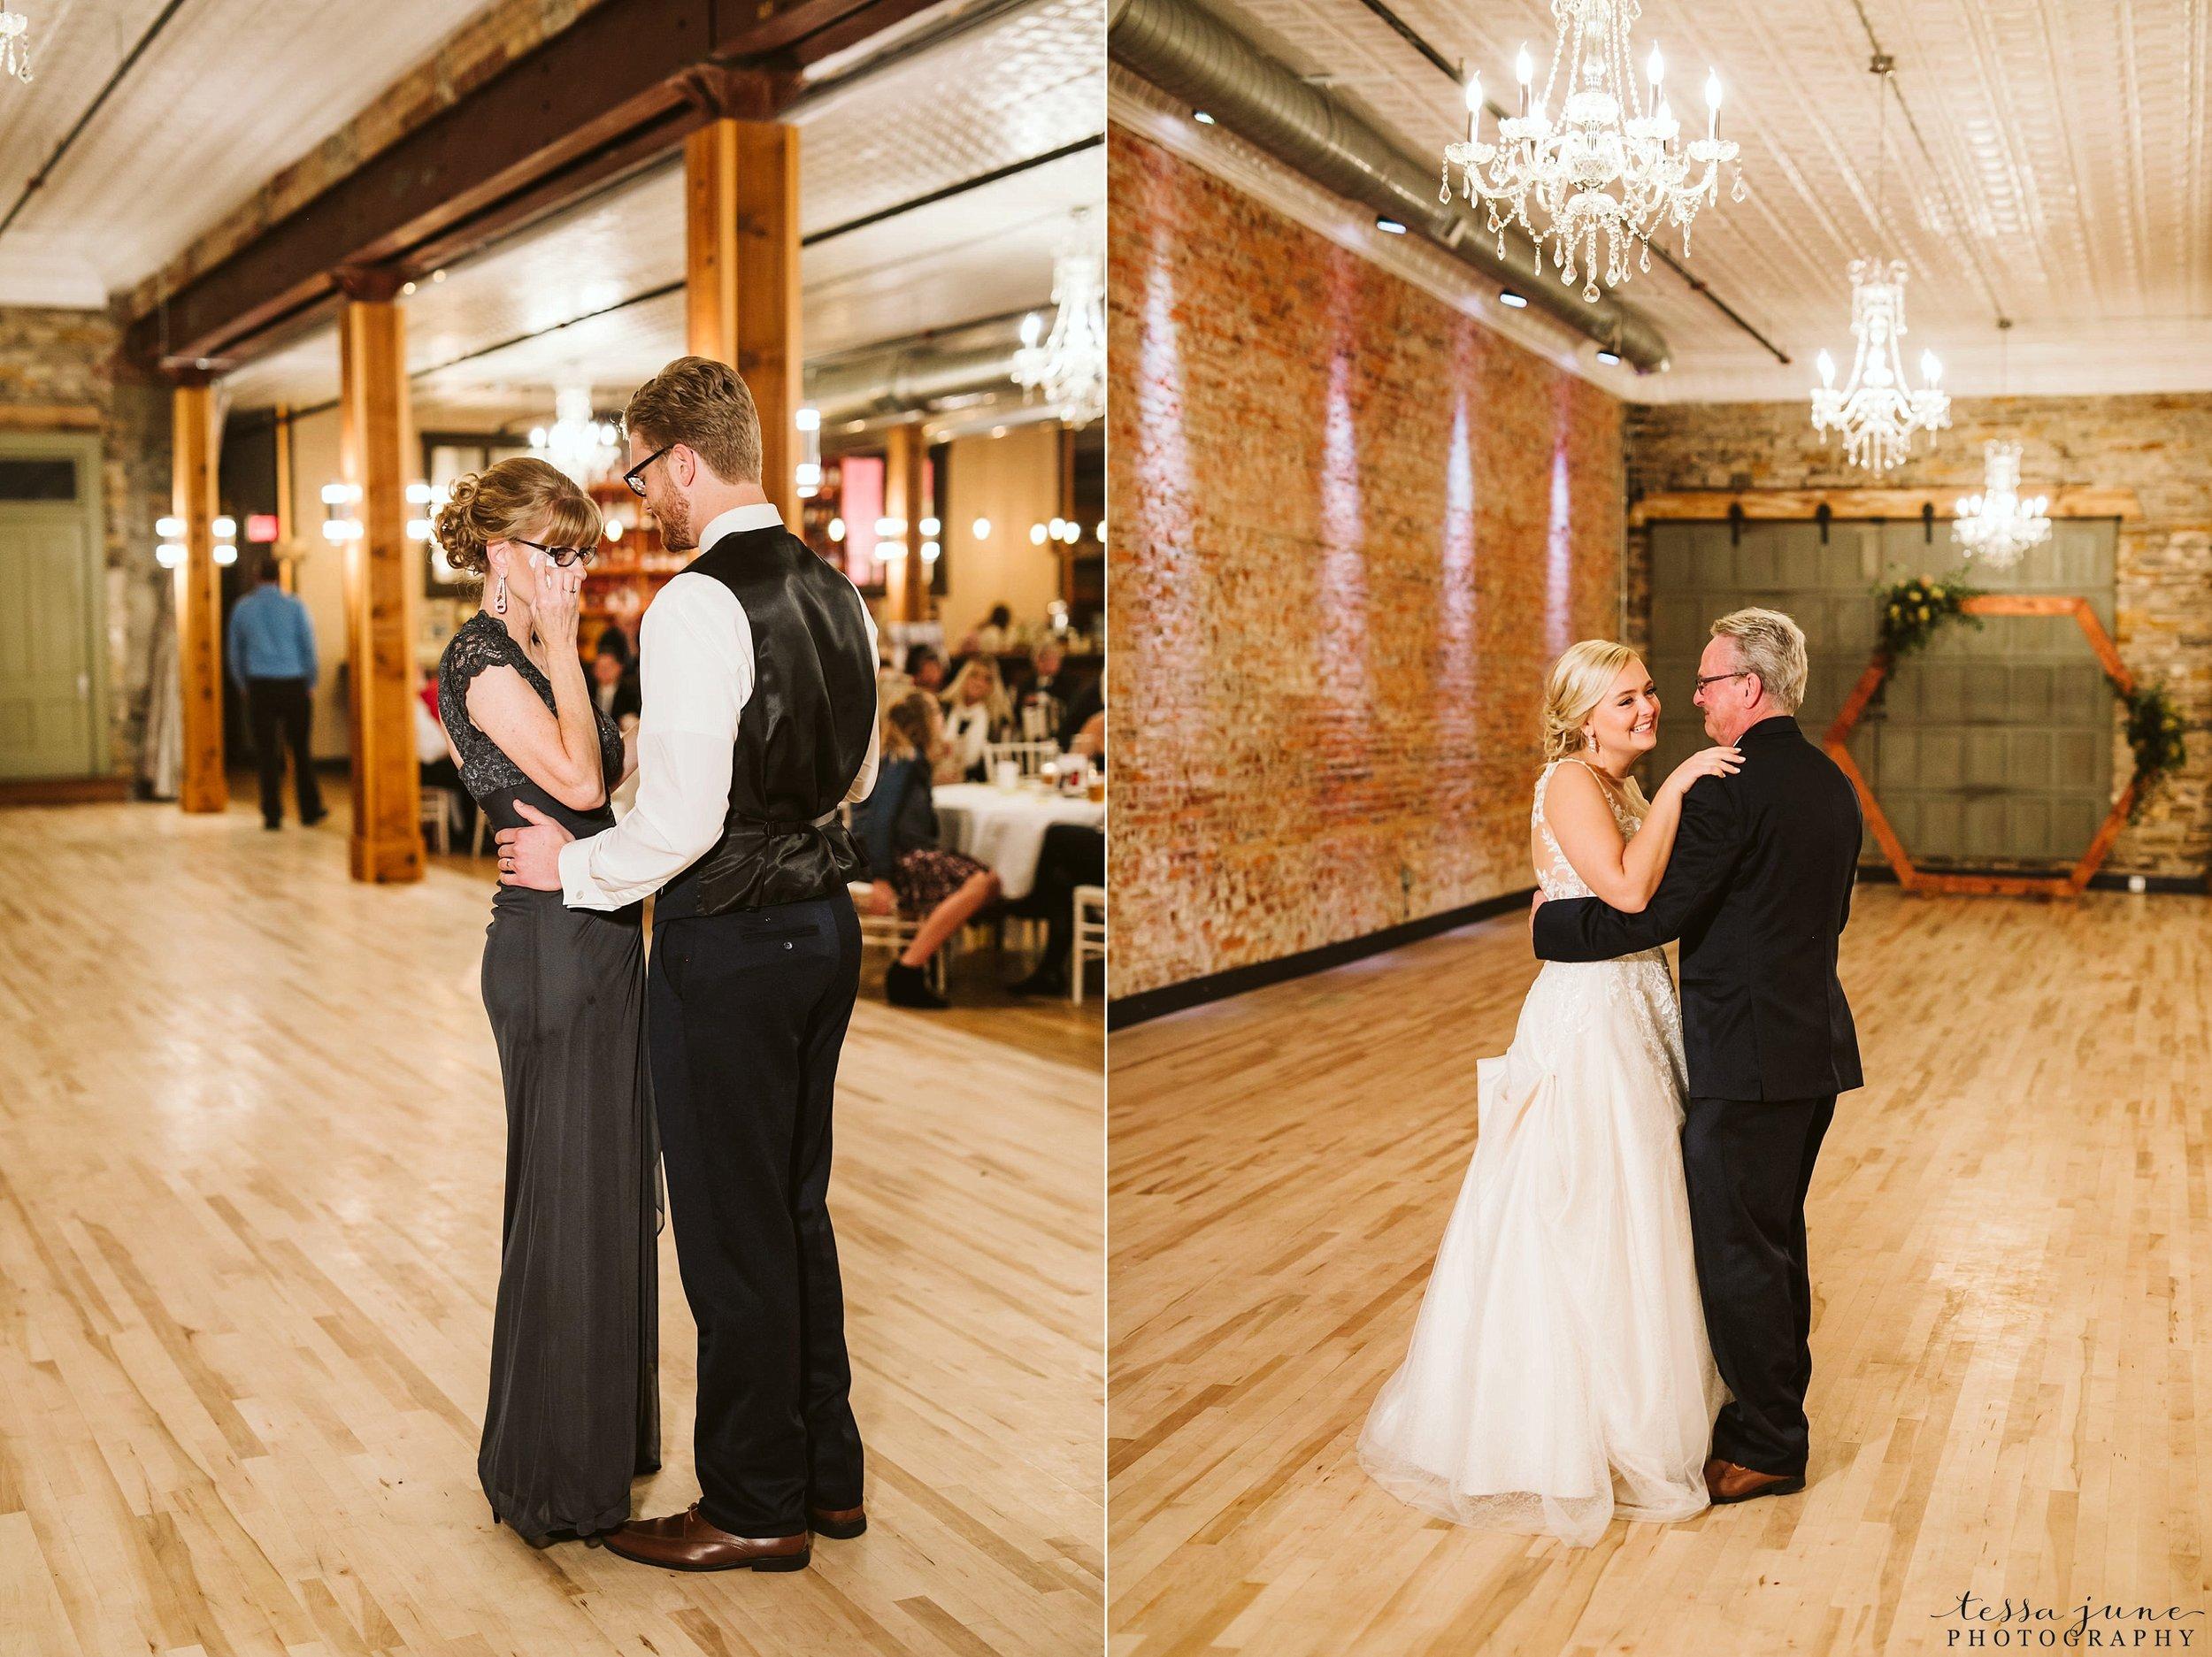 the-3-ten-event-venue-november-elegant-cozy-wedding-faribault-minnesota-146.jpg